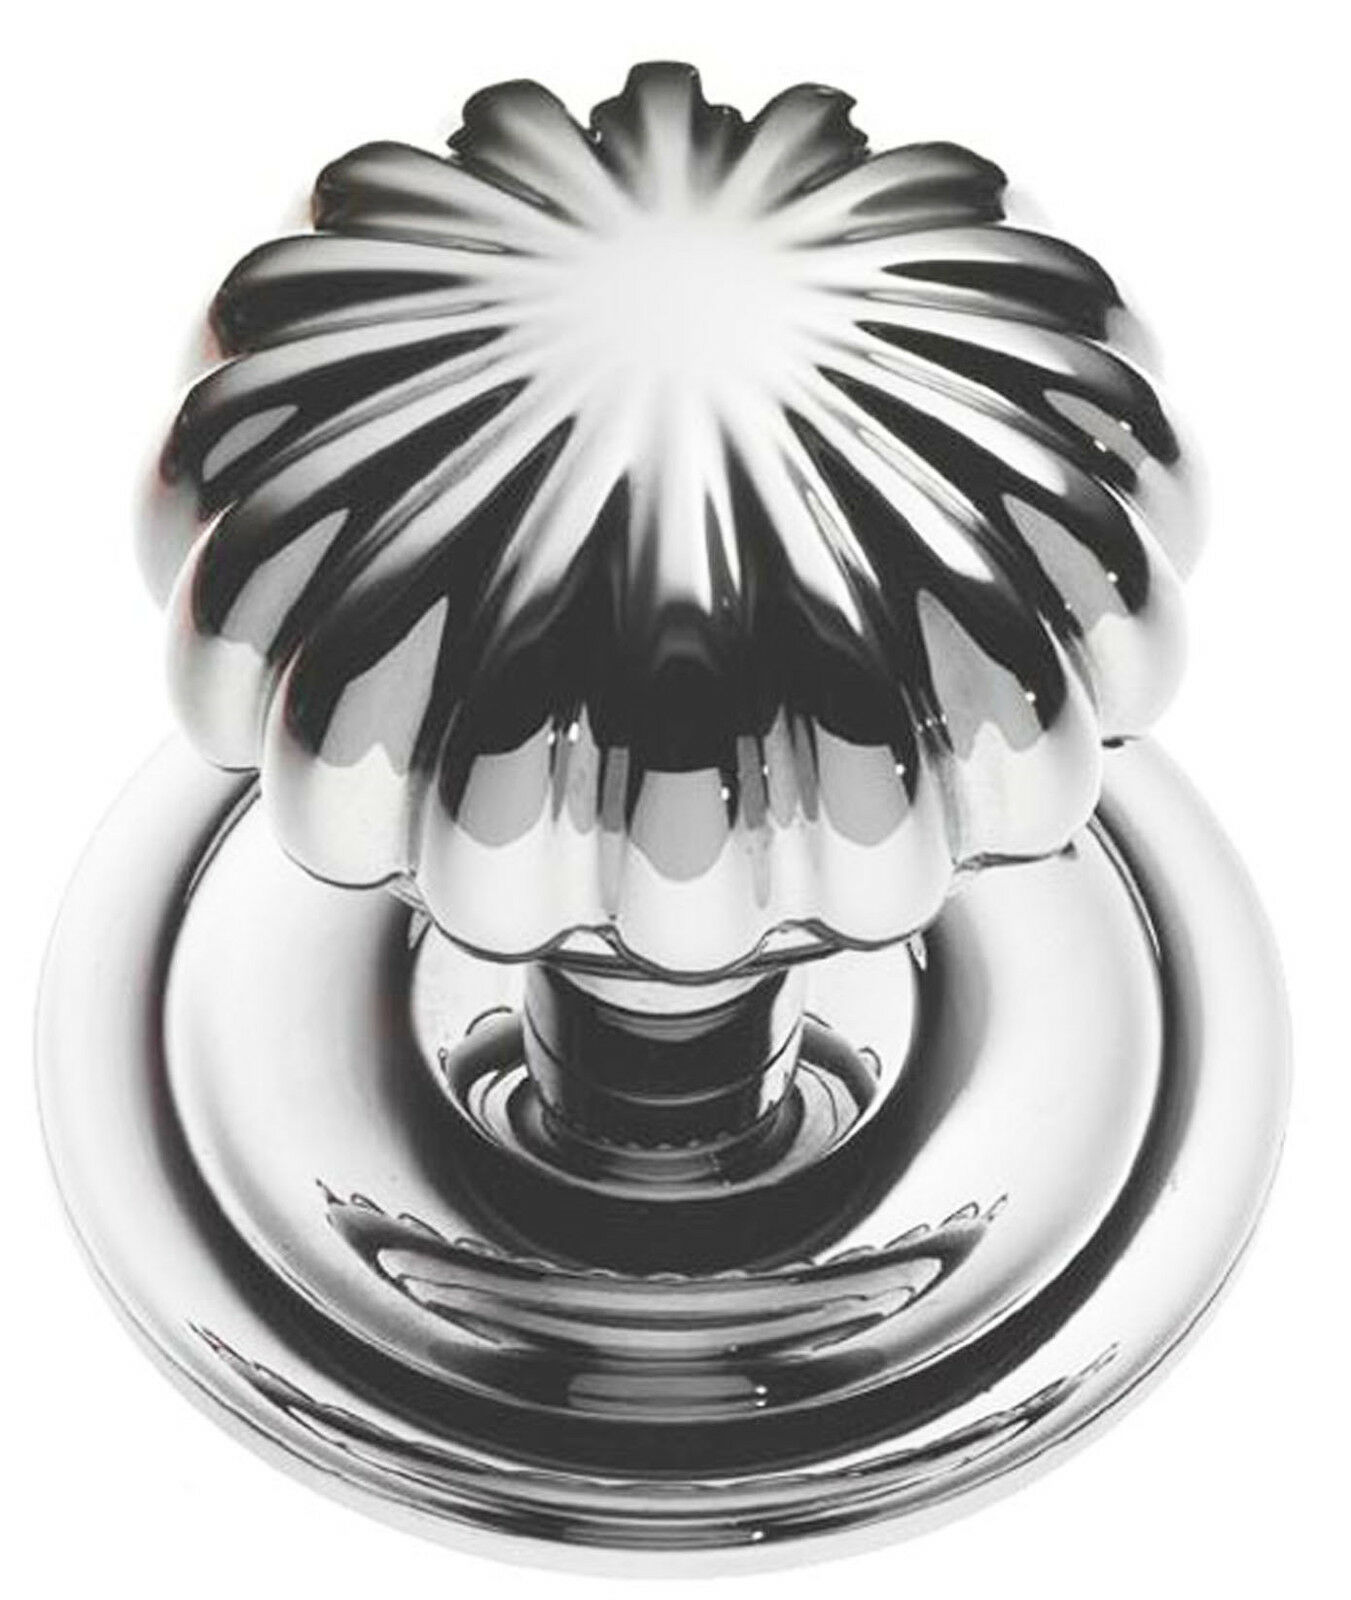 Polished Chrome Victorian  Peel \Centre Pull Door Knob   Handle (BC668)